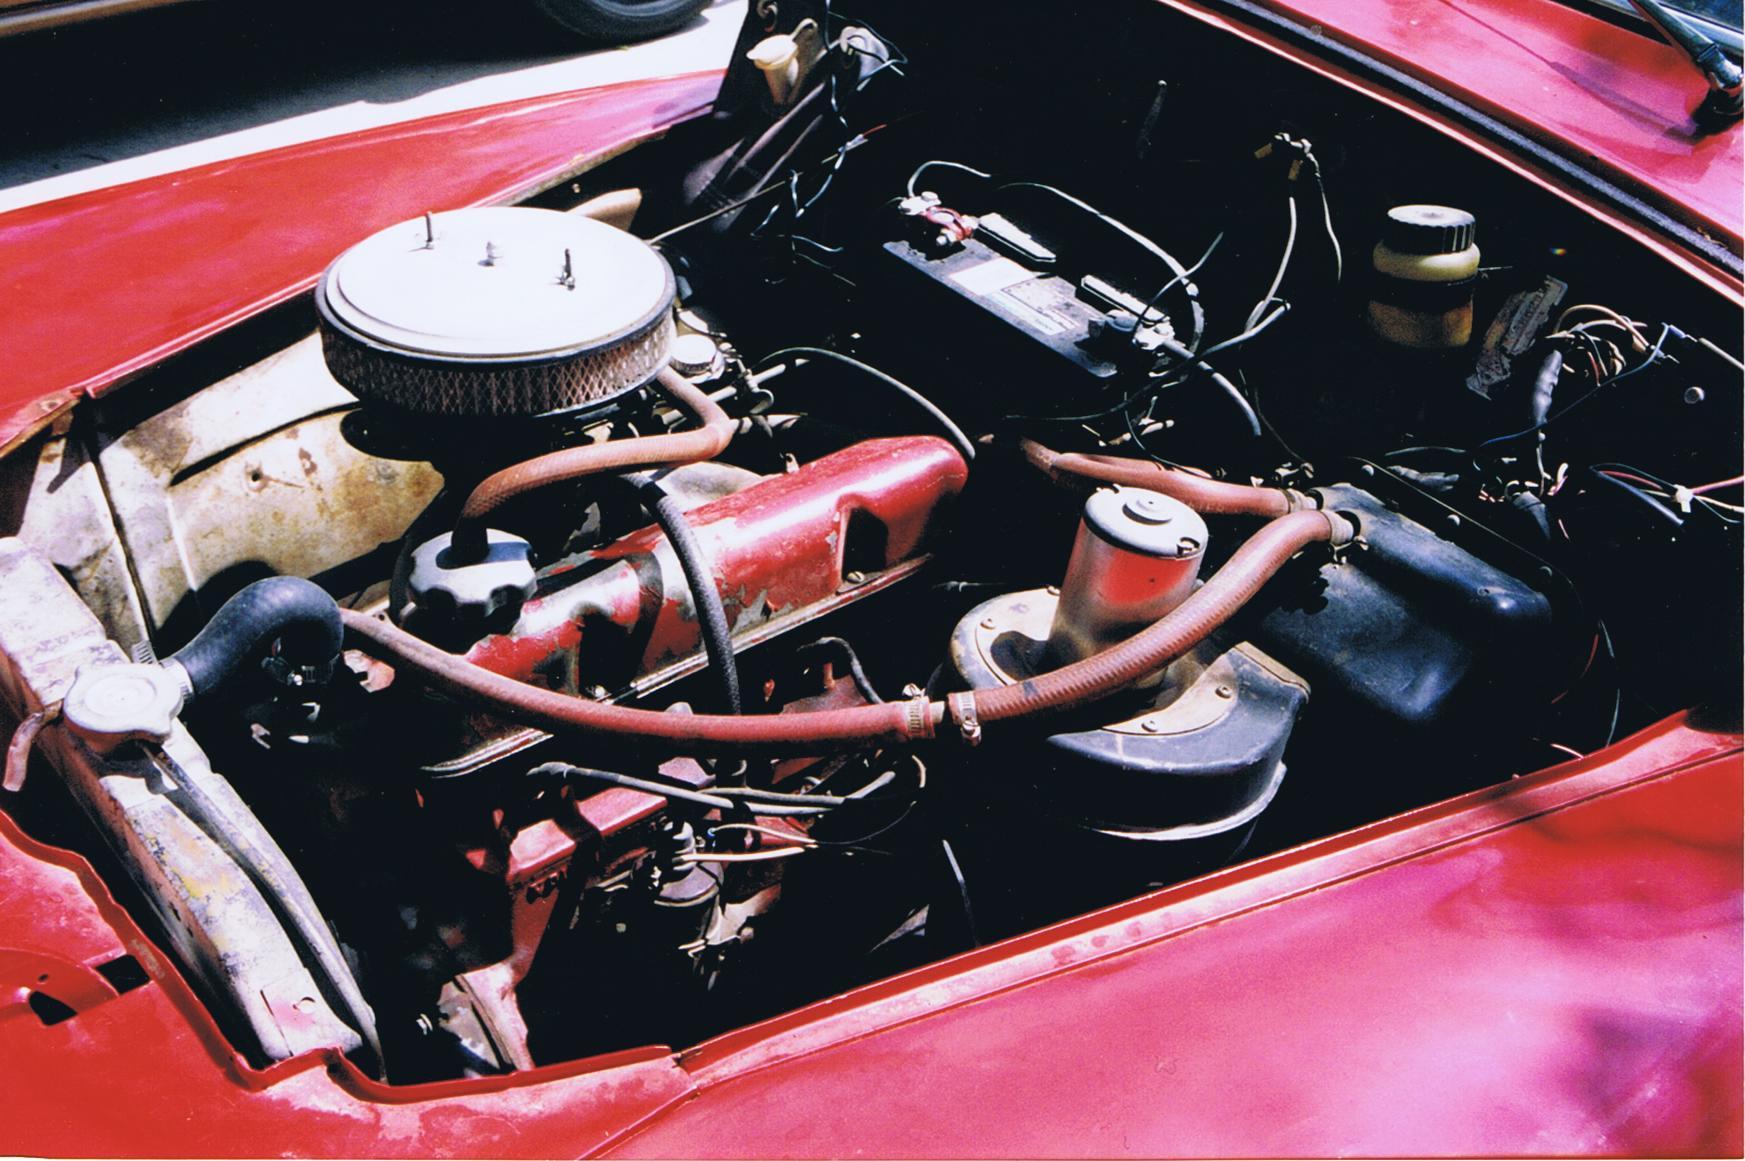 v engine.jpg